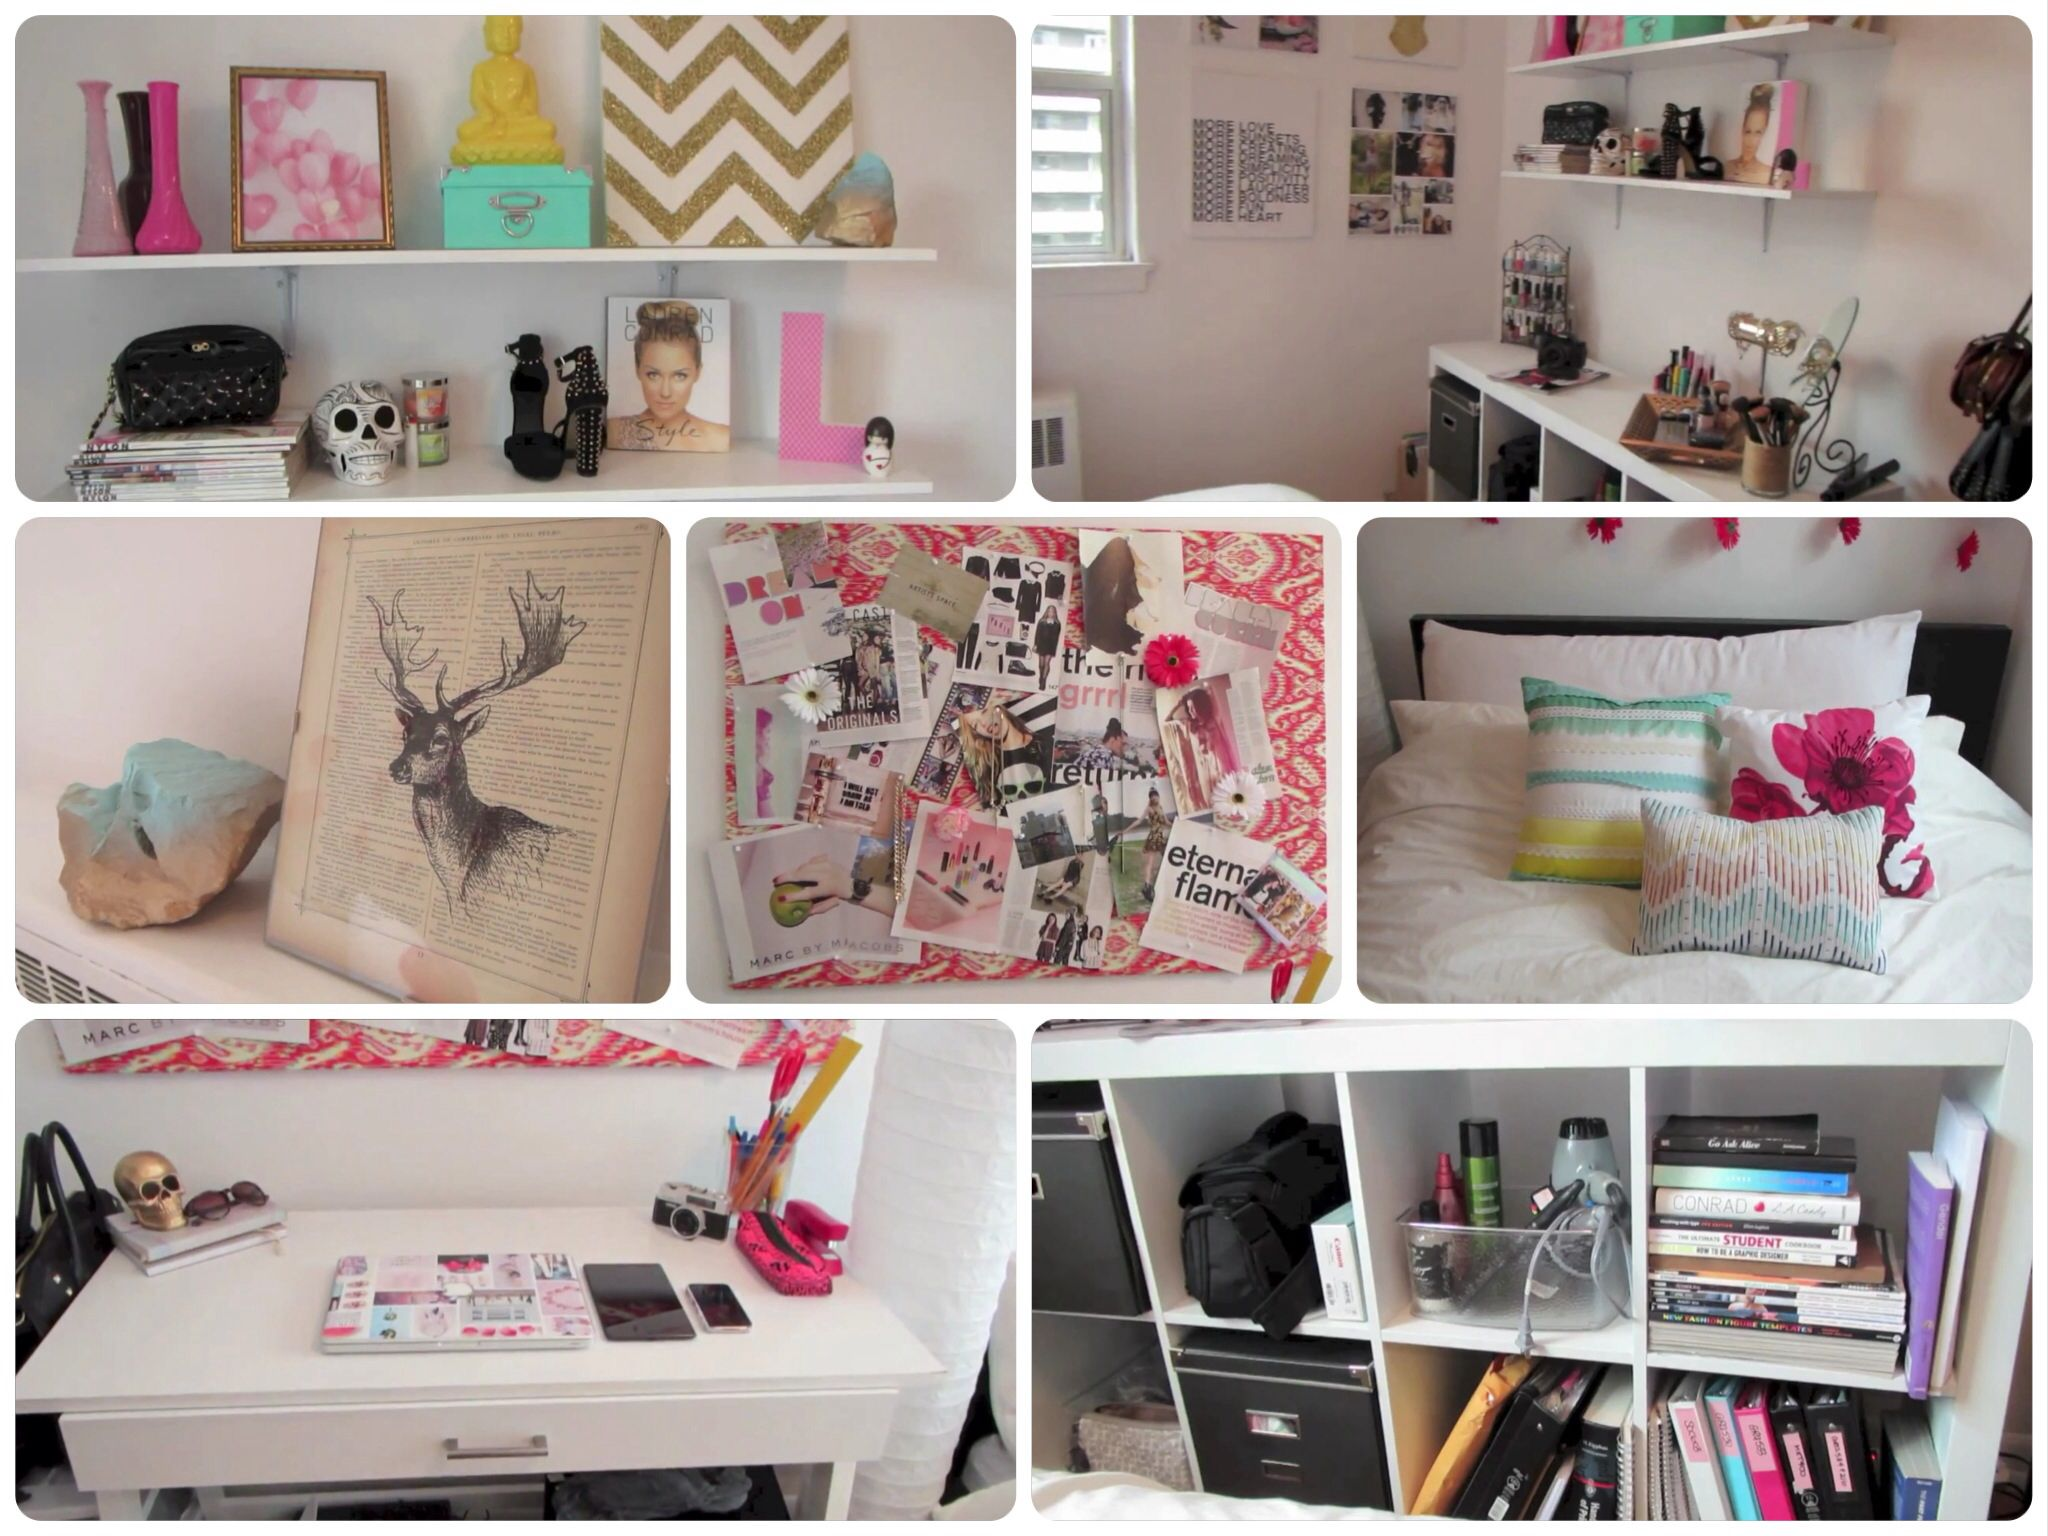 Bethany Mota Bedroom Decor Line